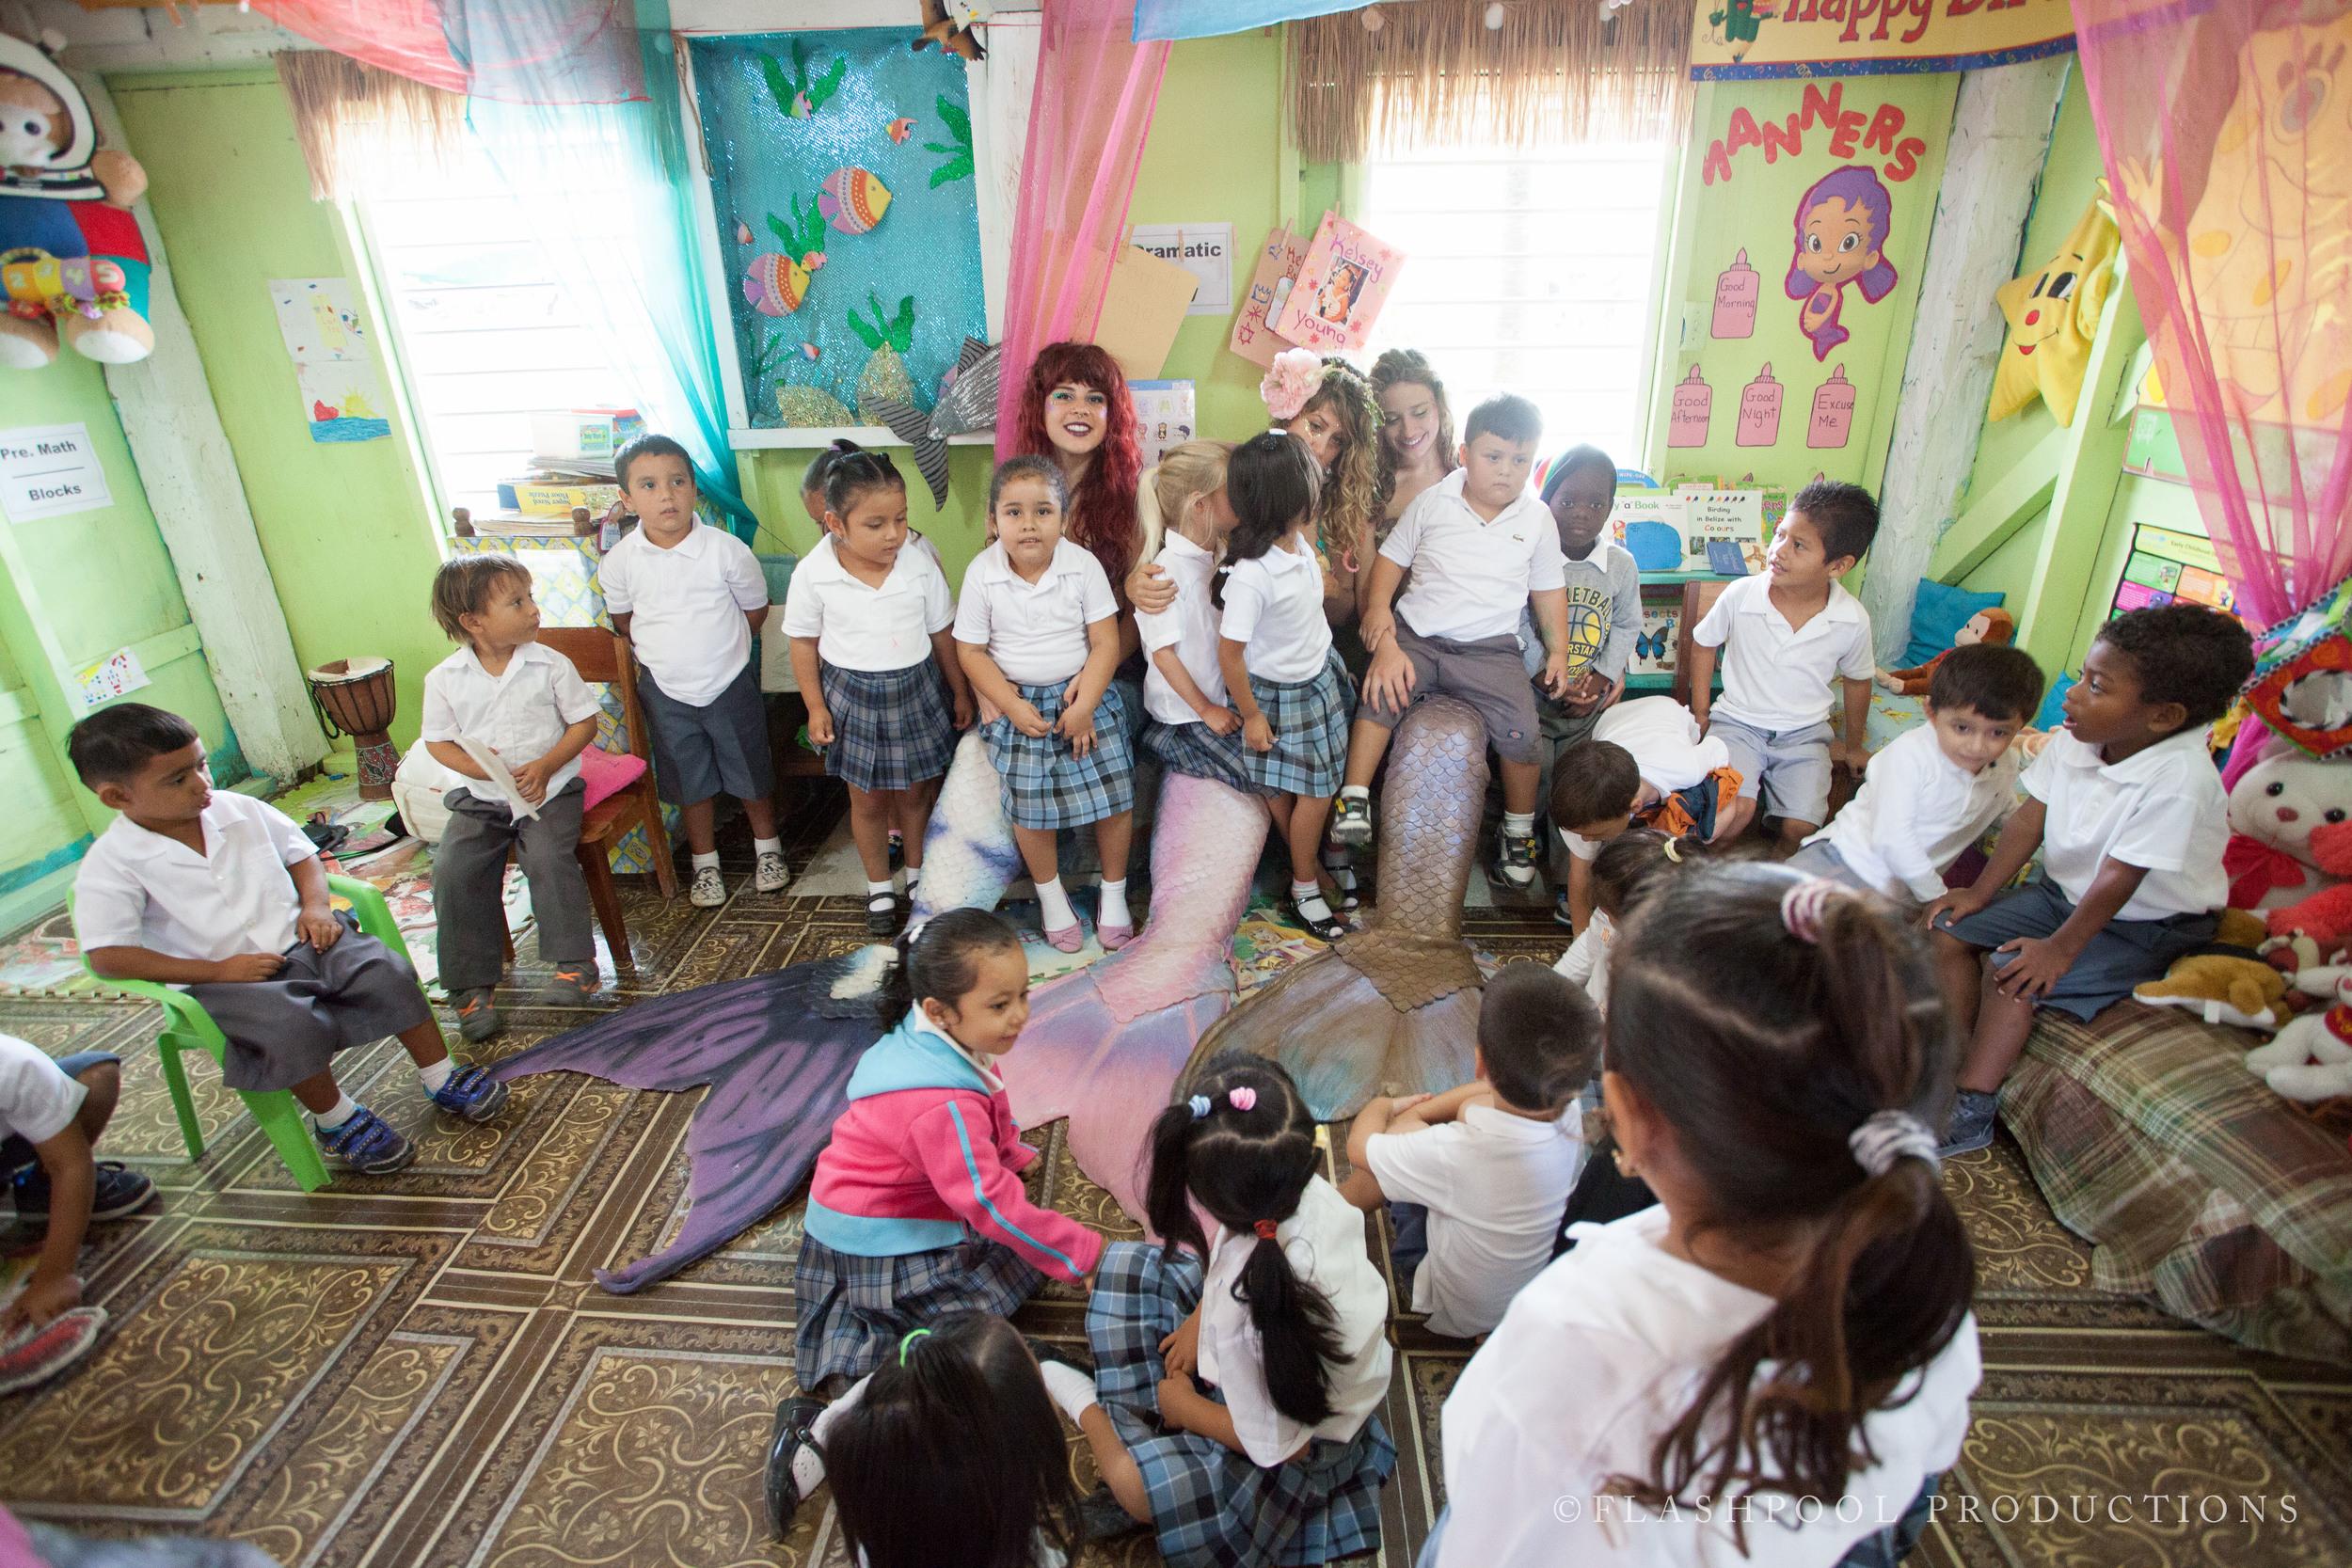 mermaidbzschool (5 of 89)-ZF-5394-55390-1-001-005.jpg